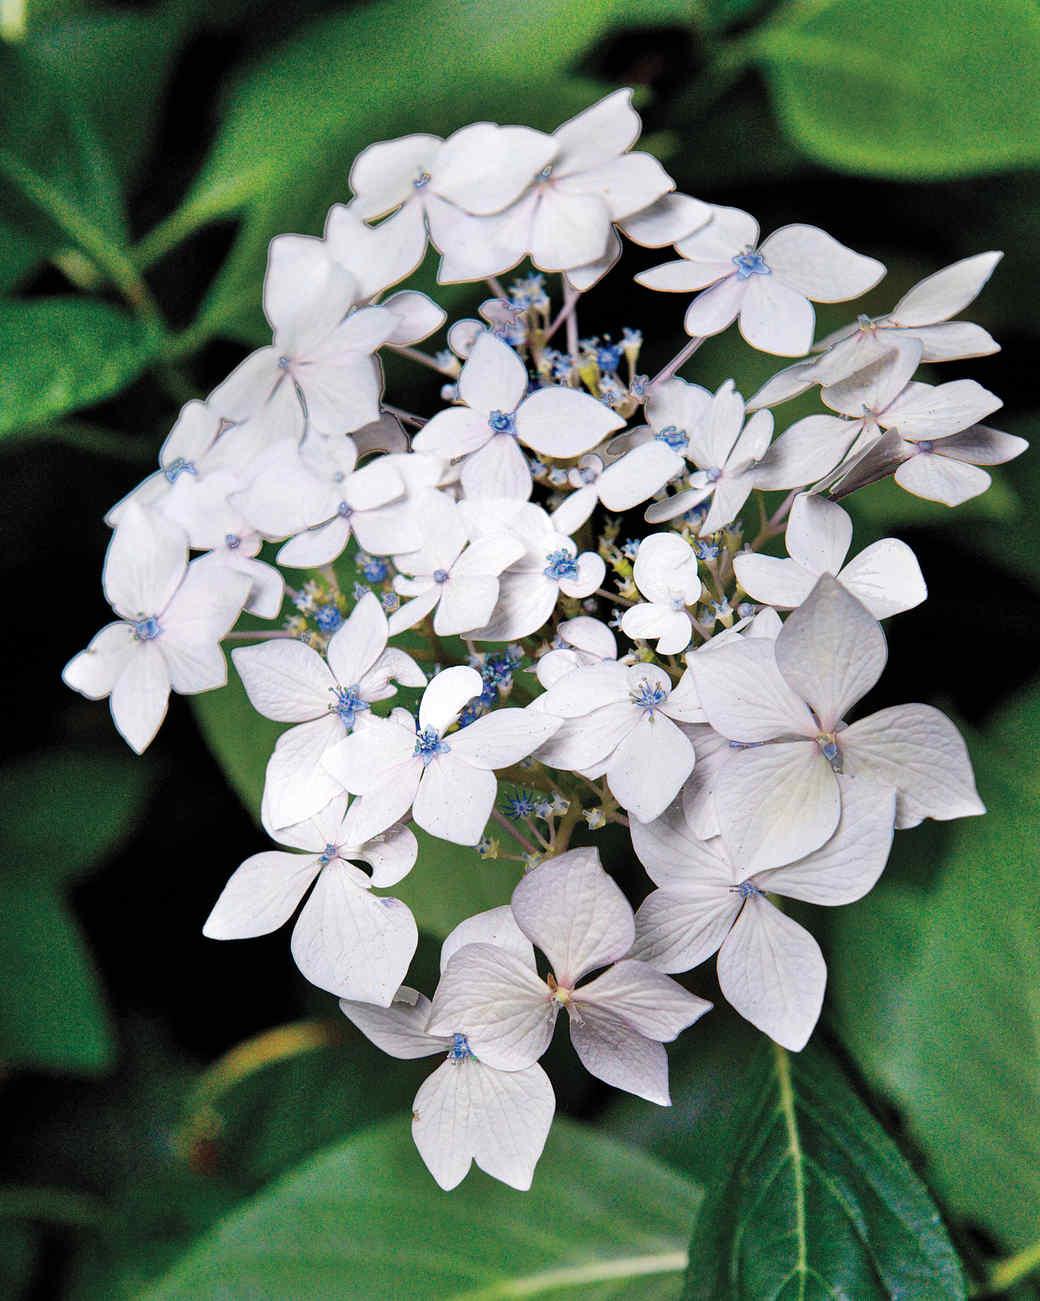 heckler-hydrangea-garden-522433aj-dsc8107-s111010.jpg